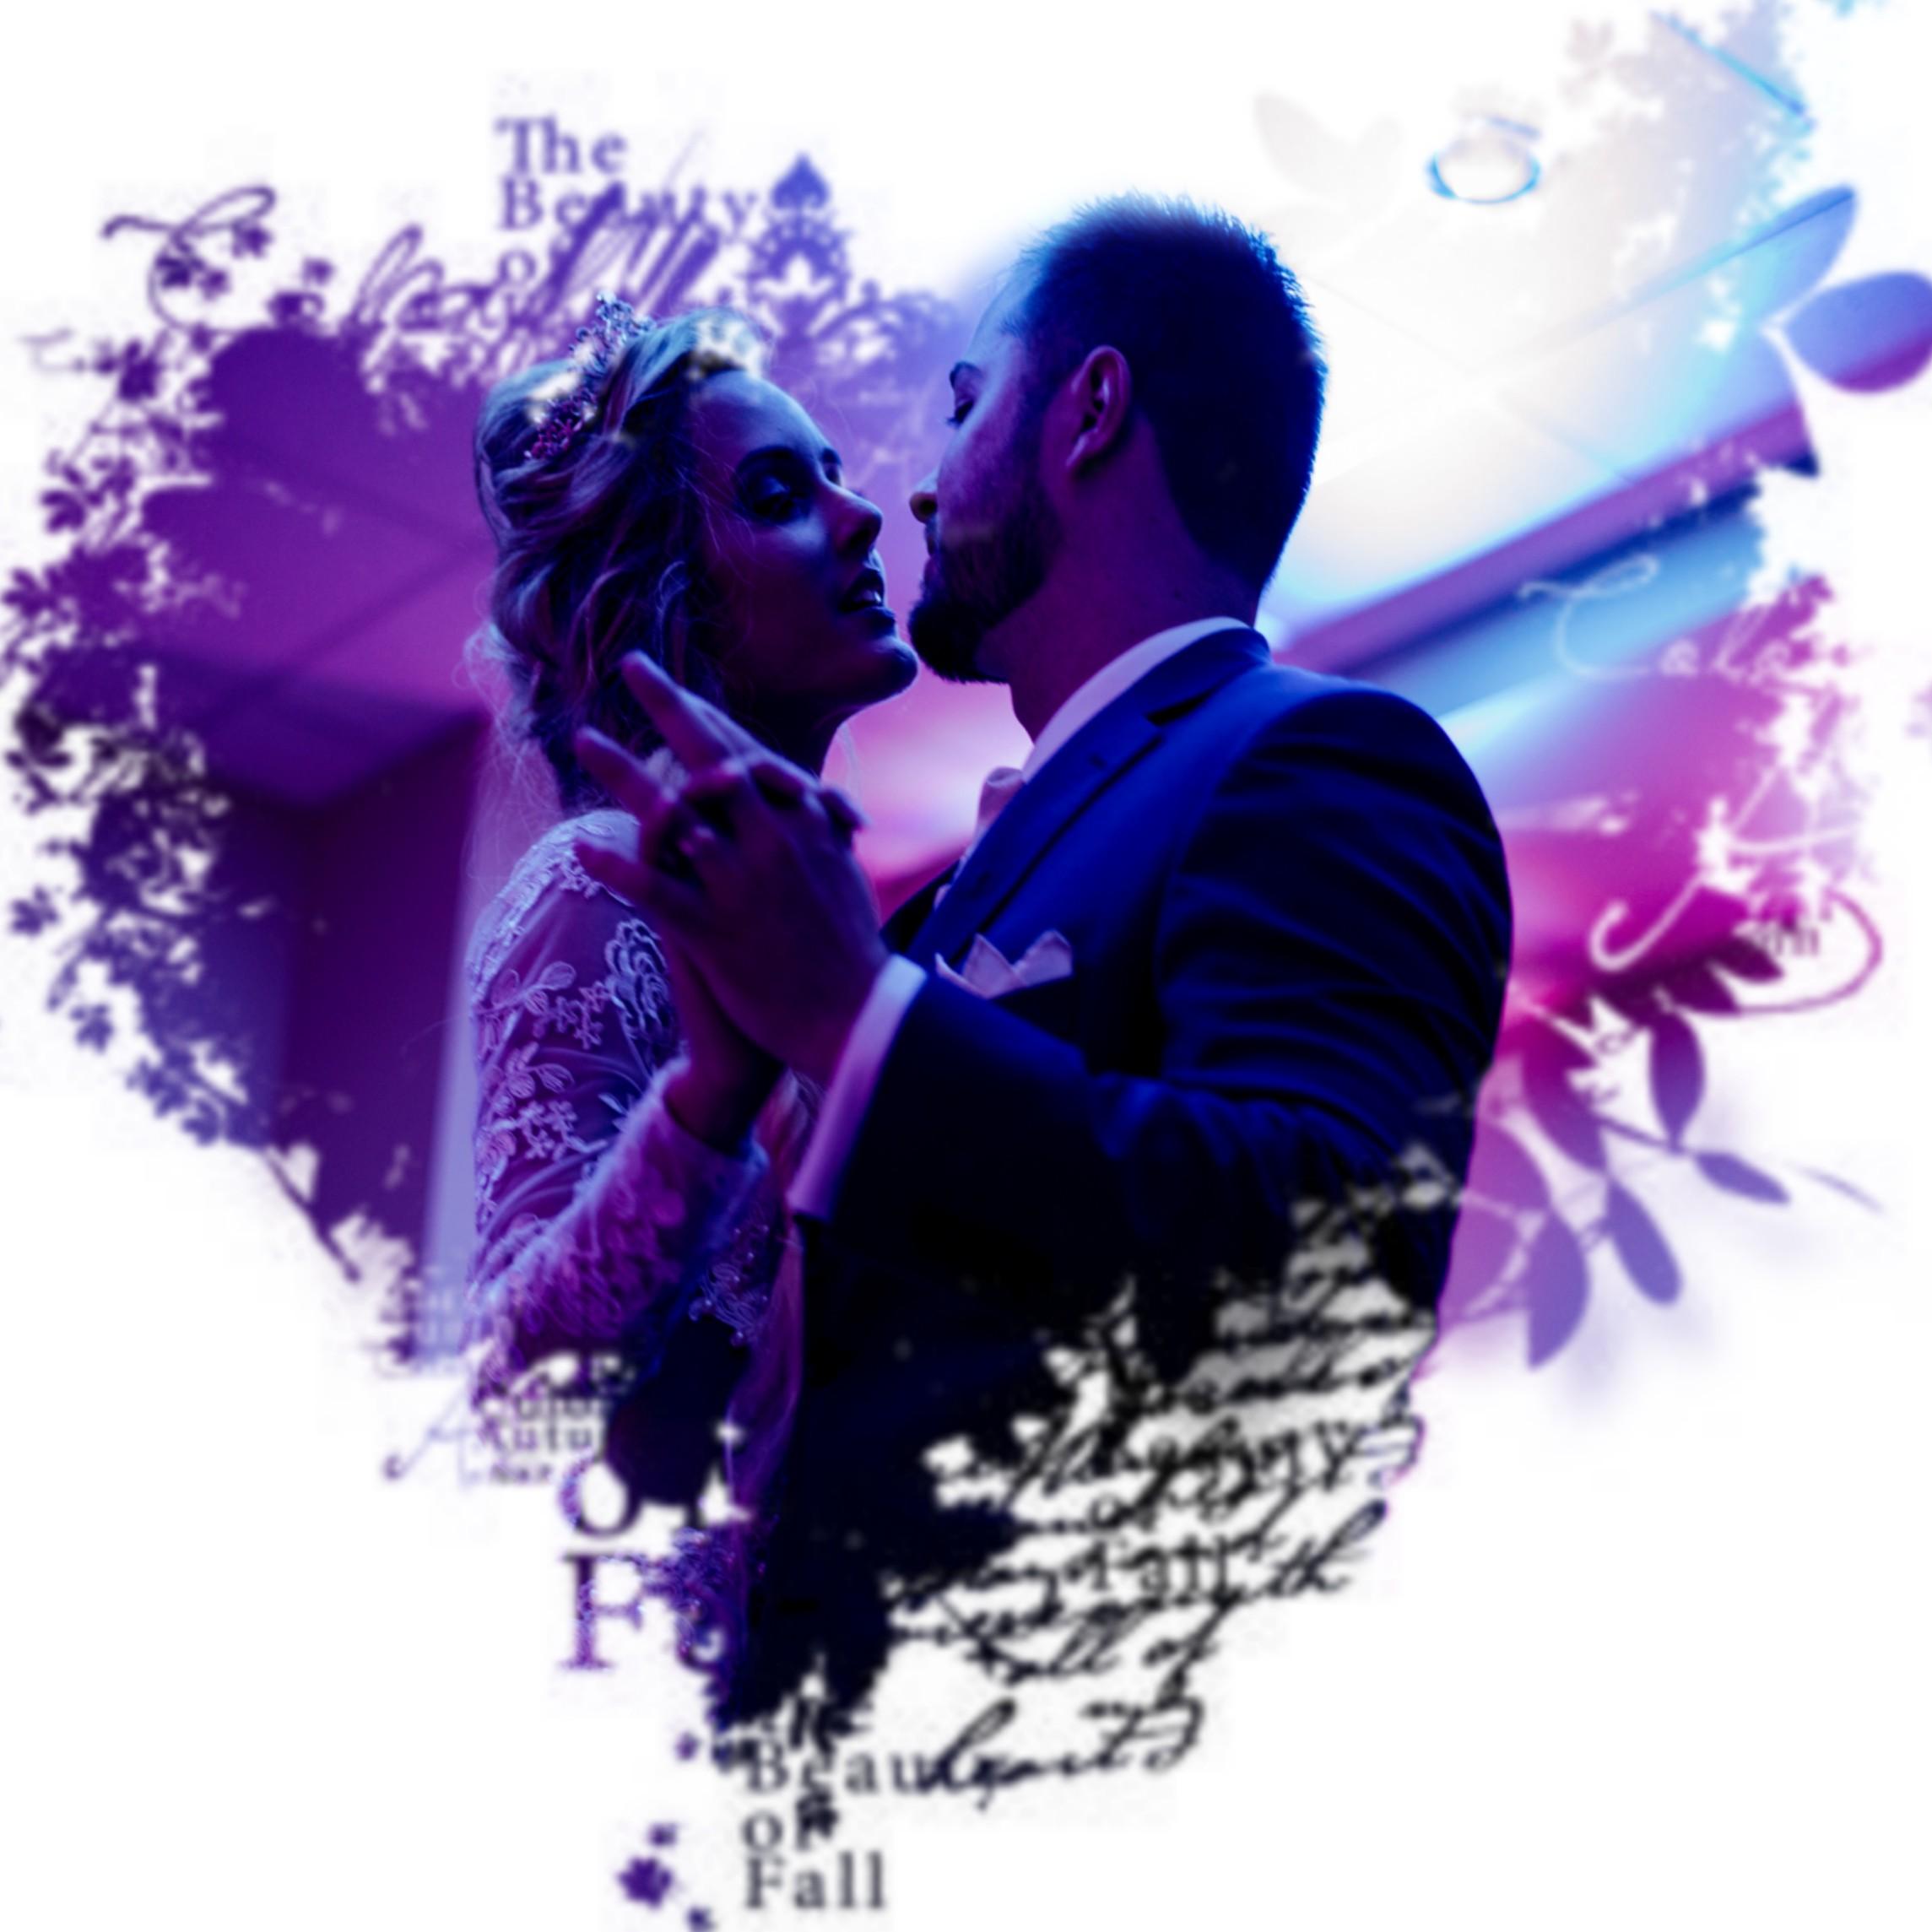 #freetoedit #splash#love#heart#dripeffect#trending#replay#myreplay#neon#picsart